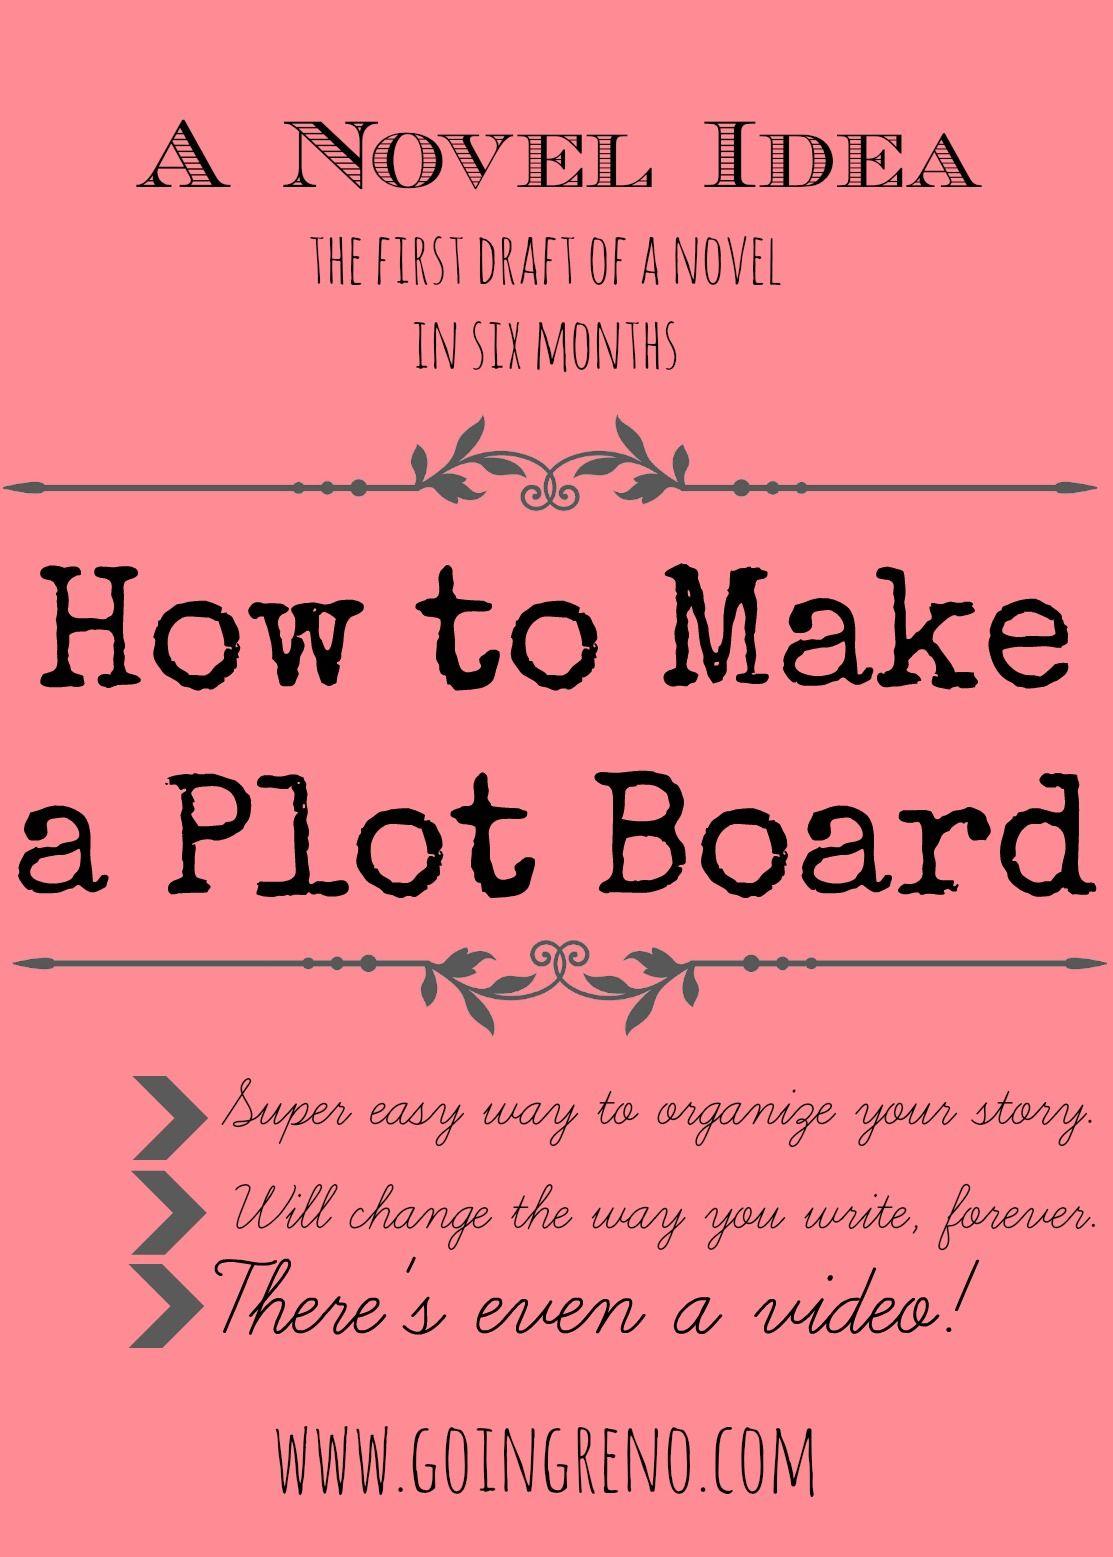 A Novel Idea How To Make A Plot Board It S Super Simple